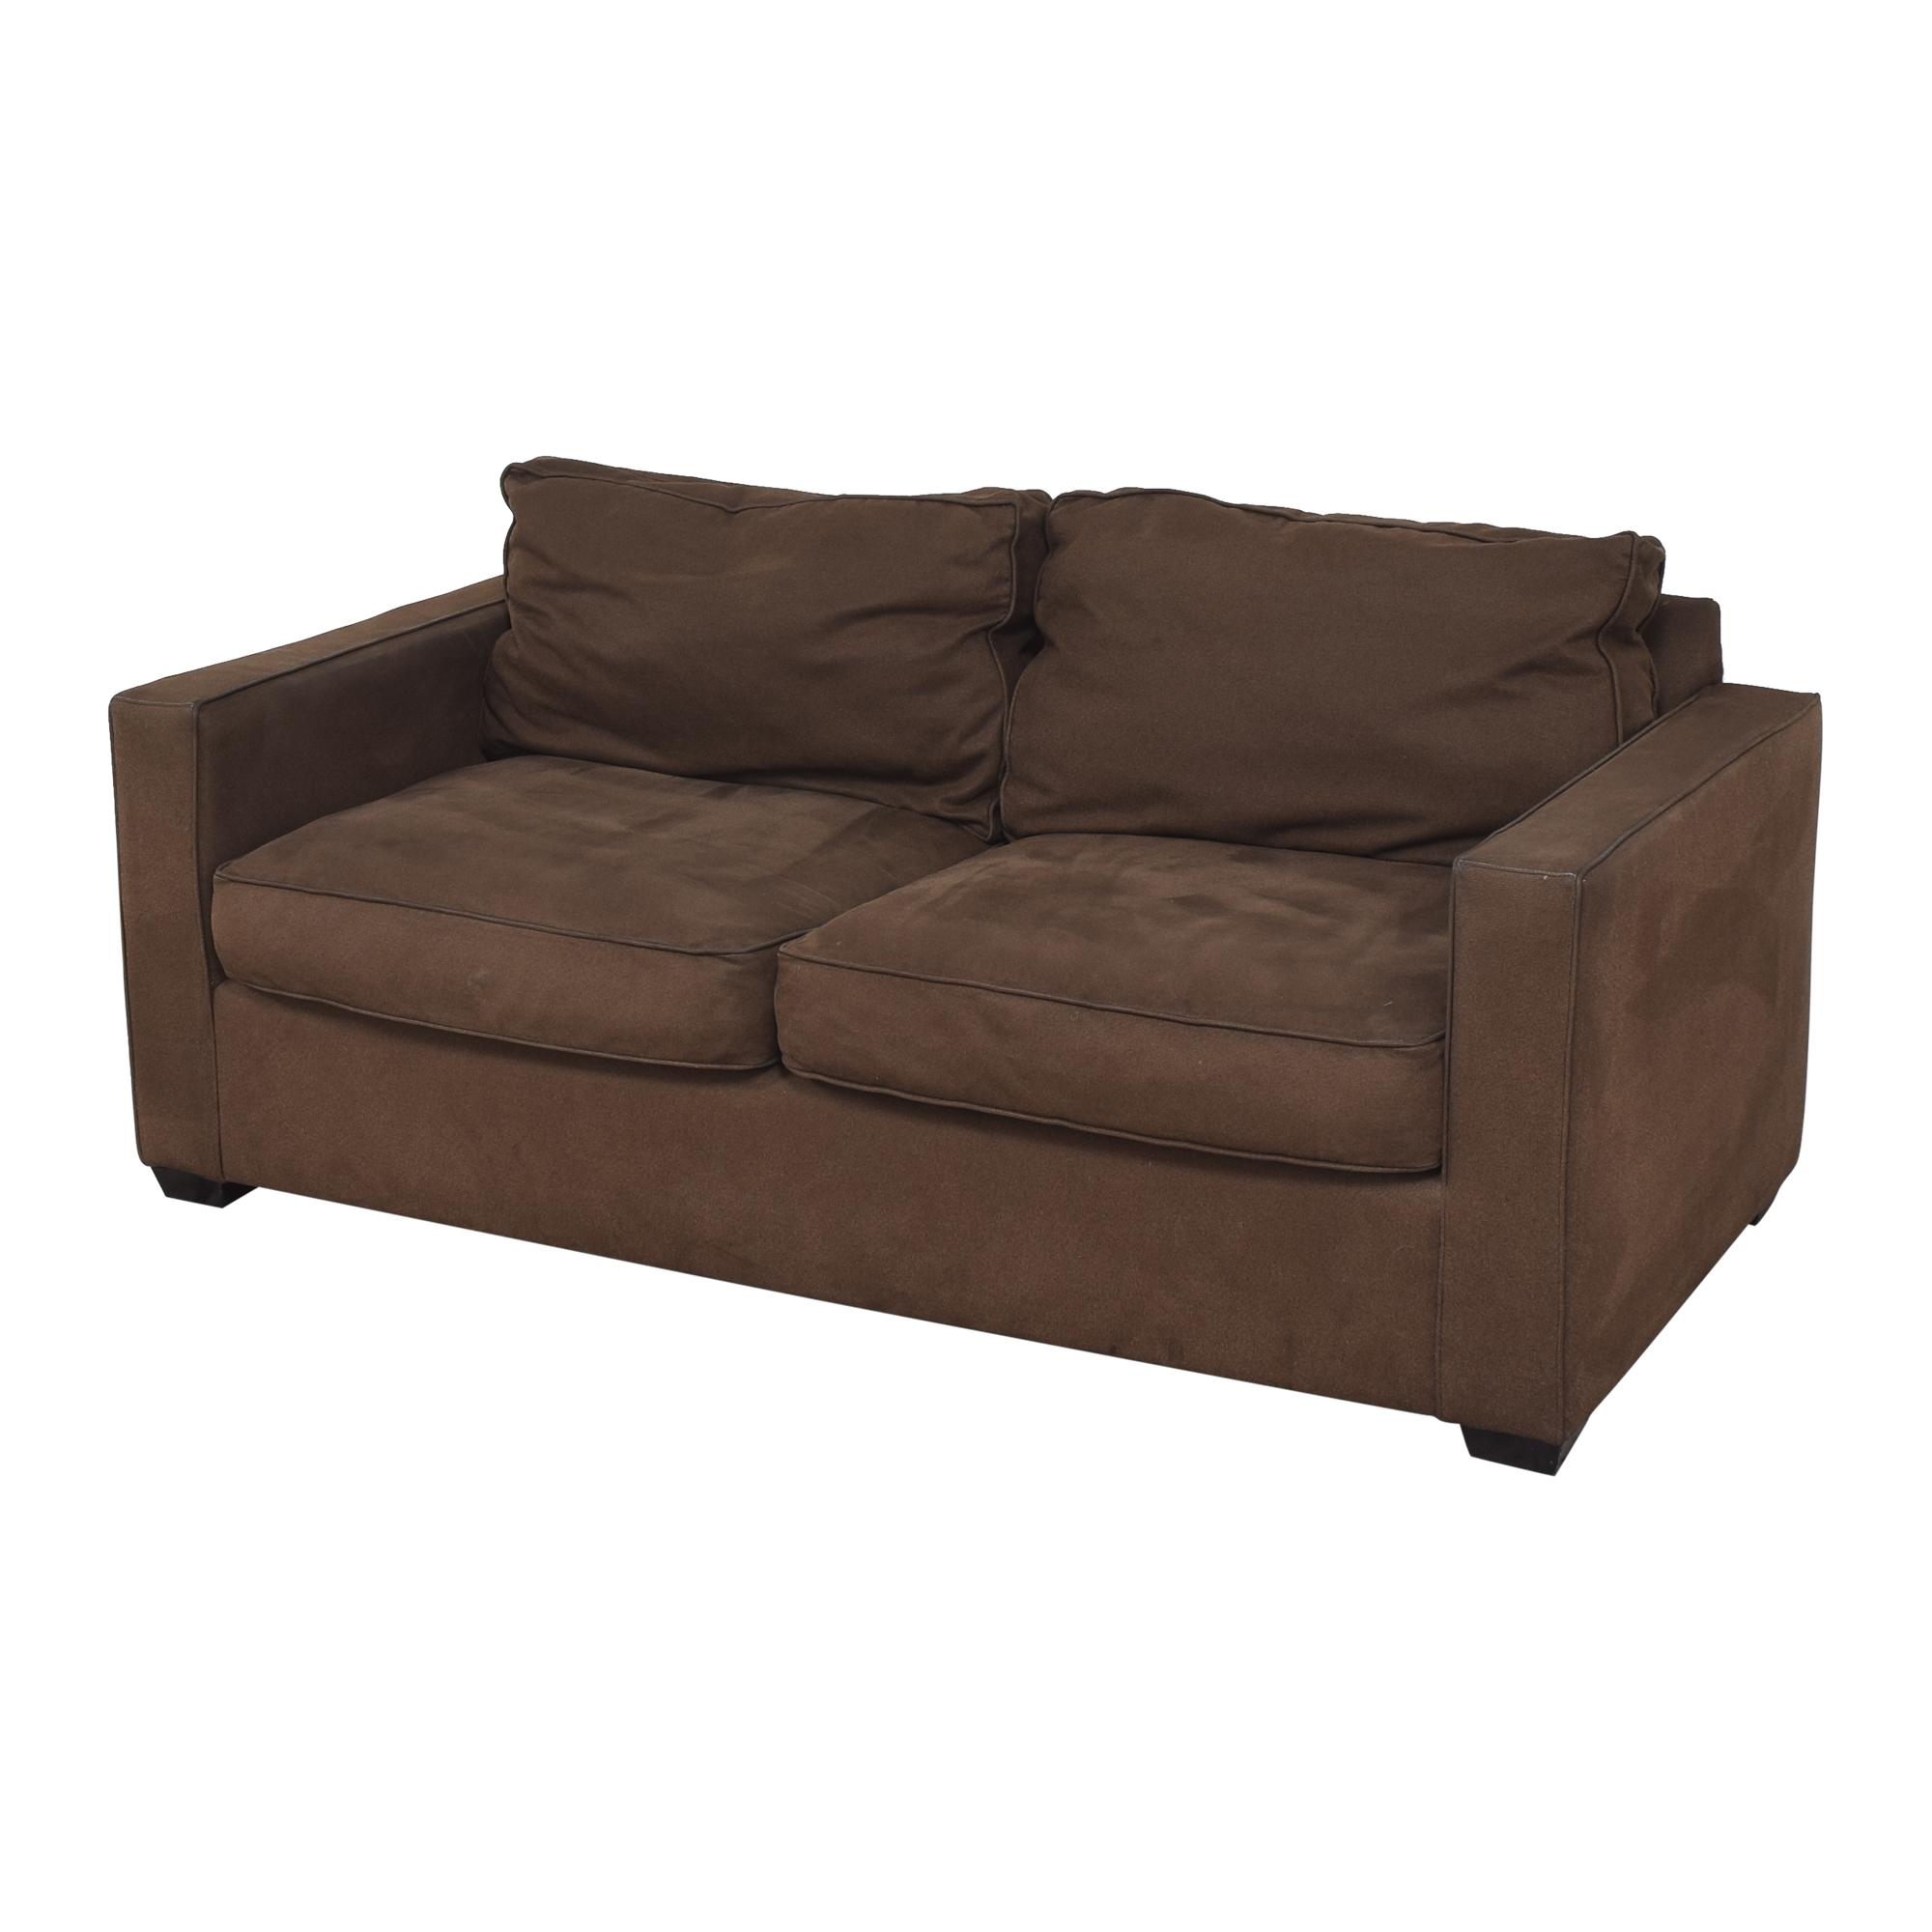 Room & Board Room & Board York Two Cushion Sofa pa